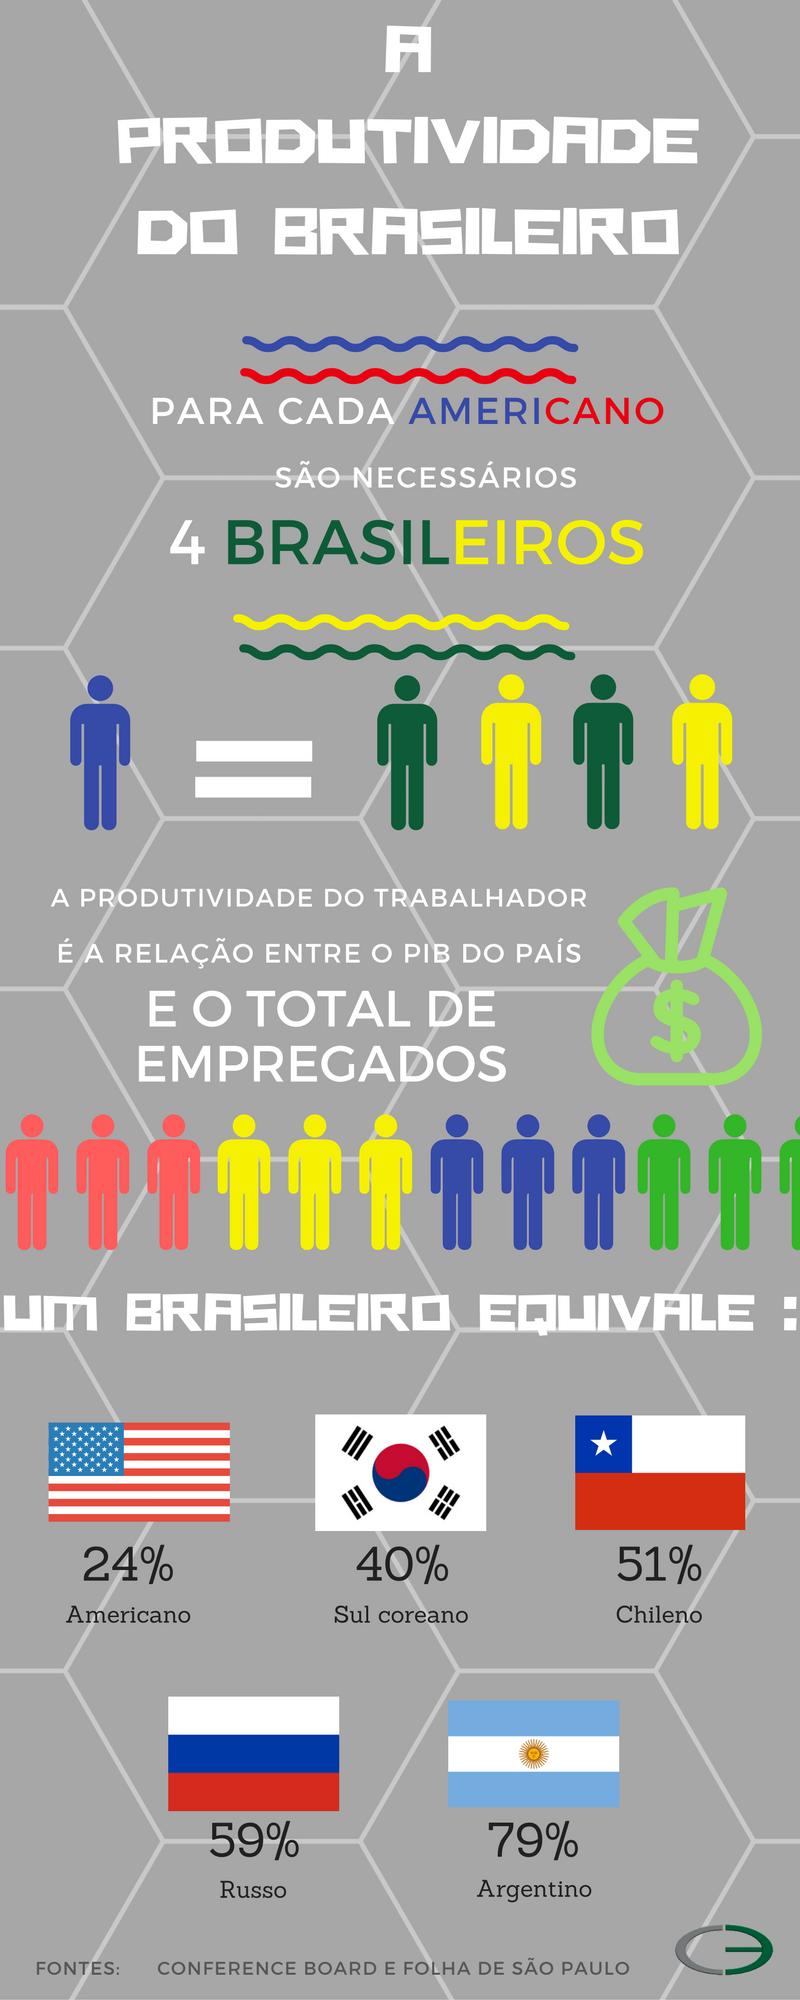 Elo Group A Baixa Produtividade Trabalhador Brasileiro Infográfico